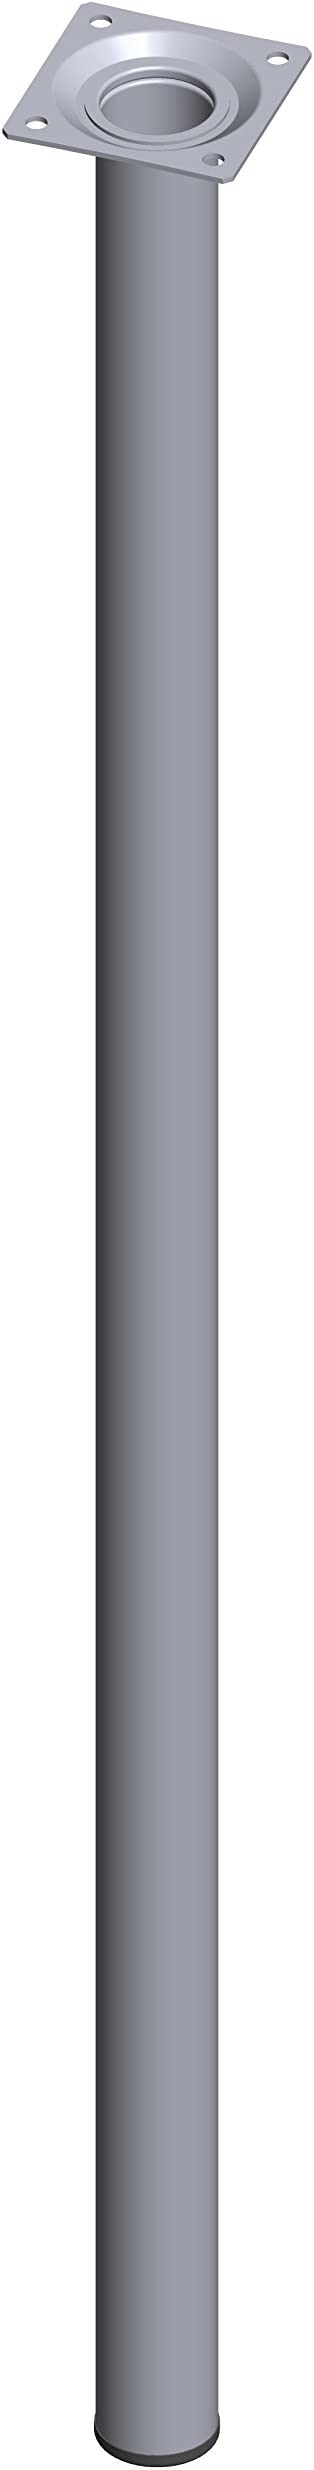 ZYElroy 10PCS Set de Combustible Tubos de Manguera Abrazadera de la Manguera del Tubo Sujetador Clip Clips 15-17mm Tubo Circular Abrazadera de Pipa de Agua del Aire